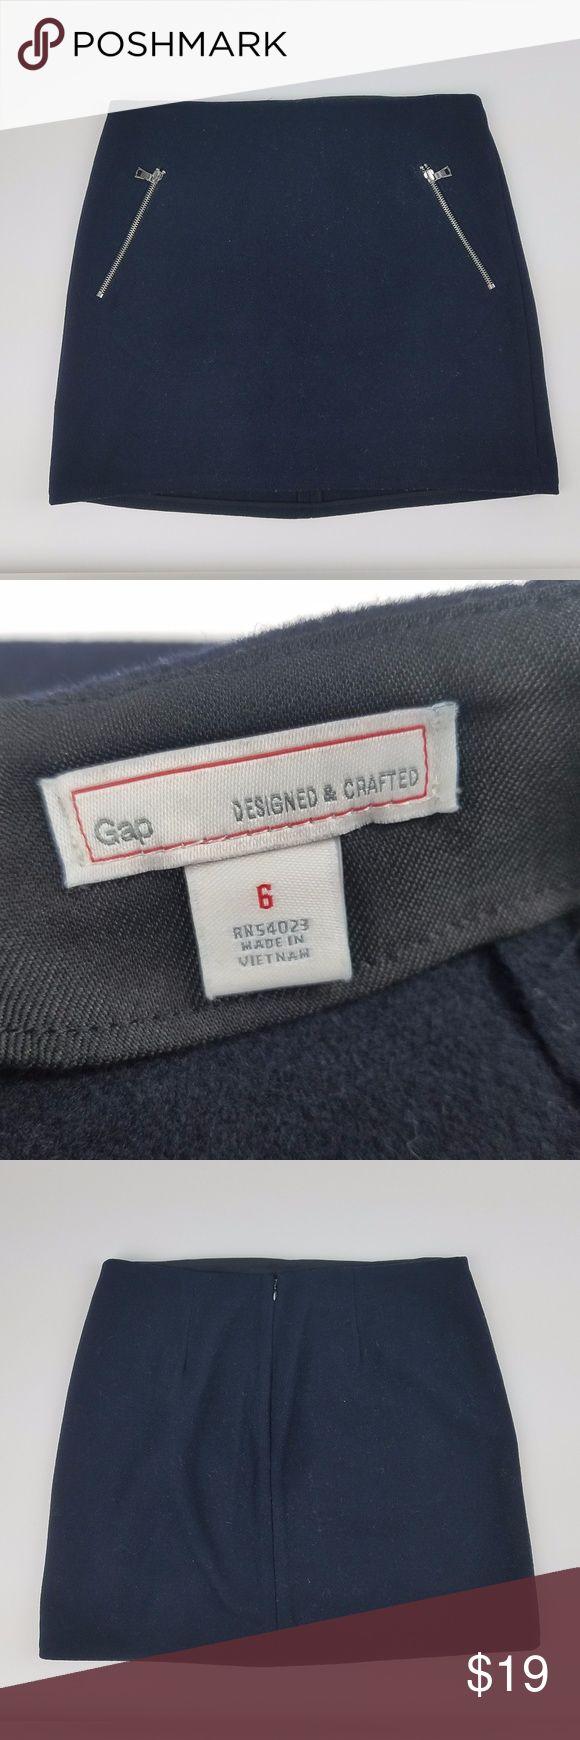 "Gap mini skirt wool black size 6 Gap designed women's skirt wool w/ pockets A line size 6 black career casual   Total Length: 16"" GAP Skirts Mini"